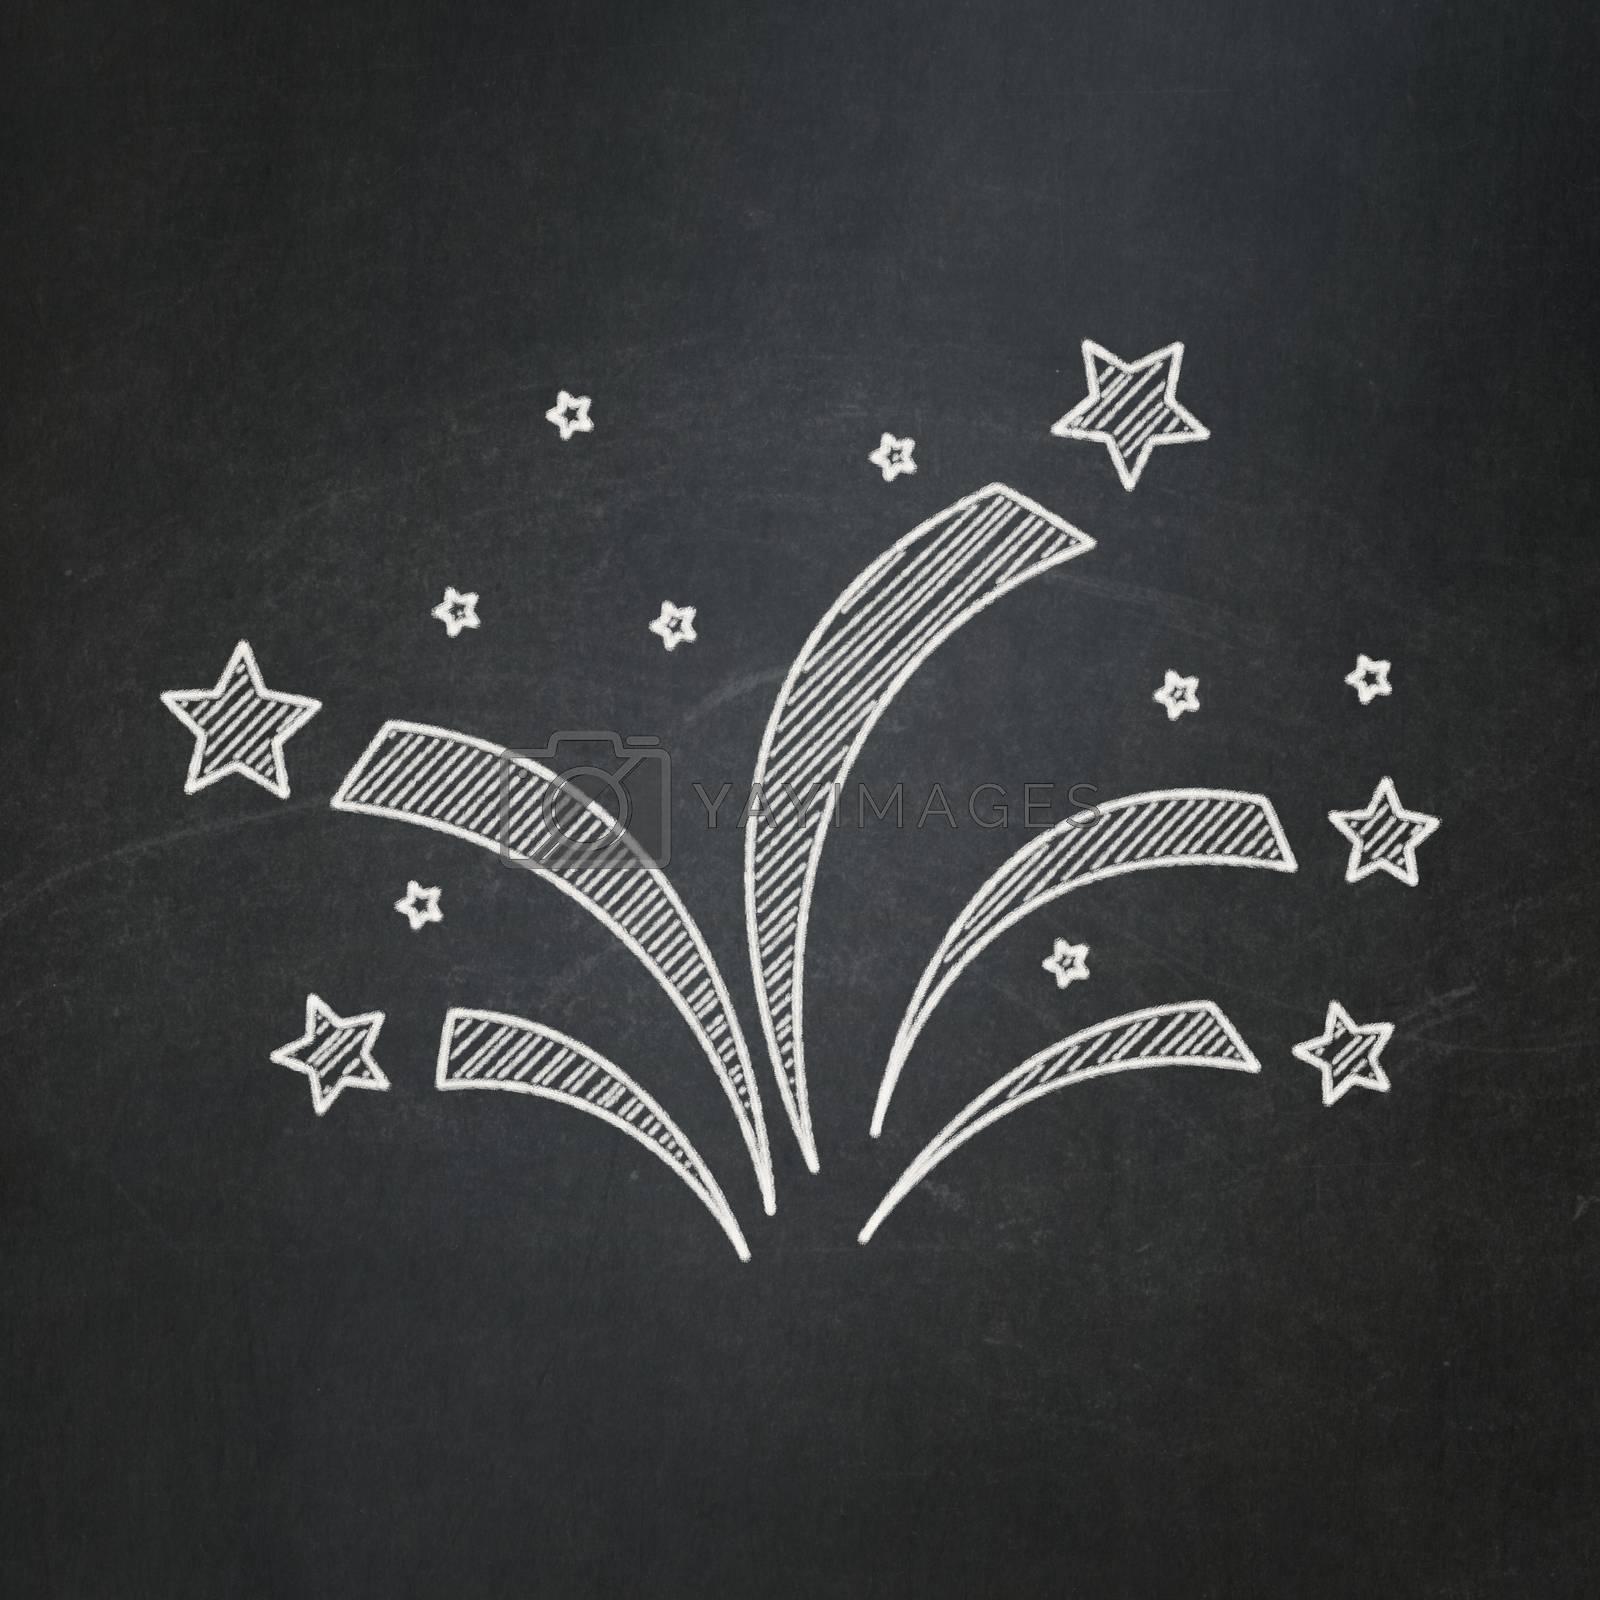 Holiday concept: Fireworks on chalkboard background by maxkabakov